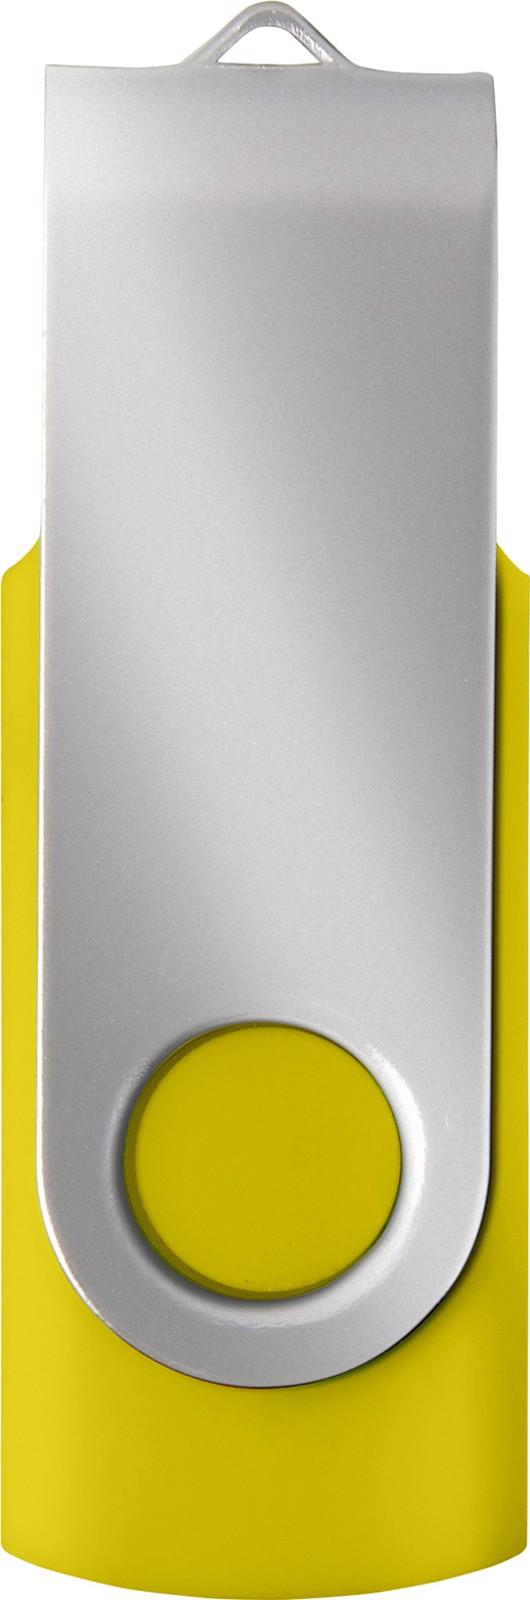 ABS USB drive (16GB/32GB) - Yellow / Silver